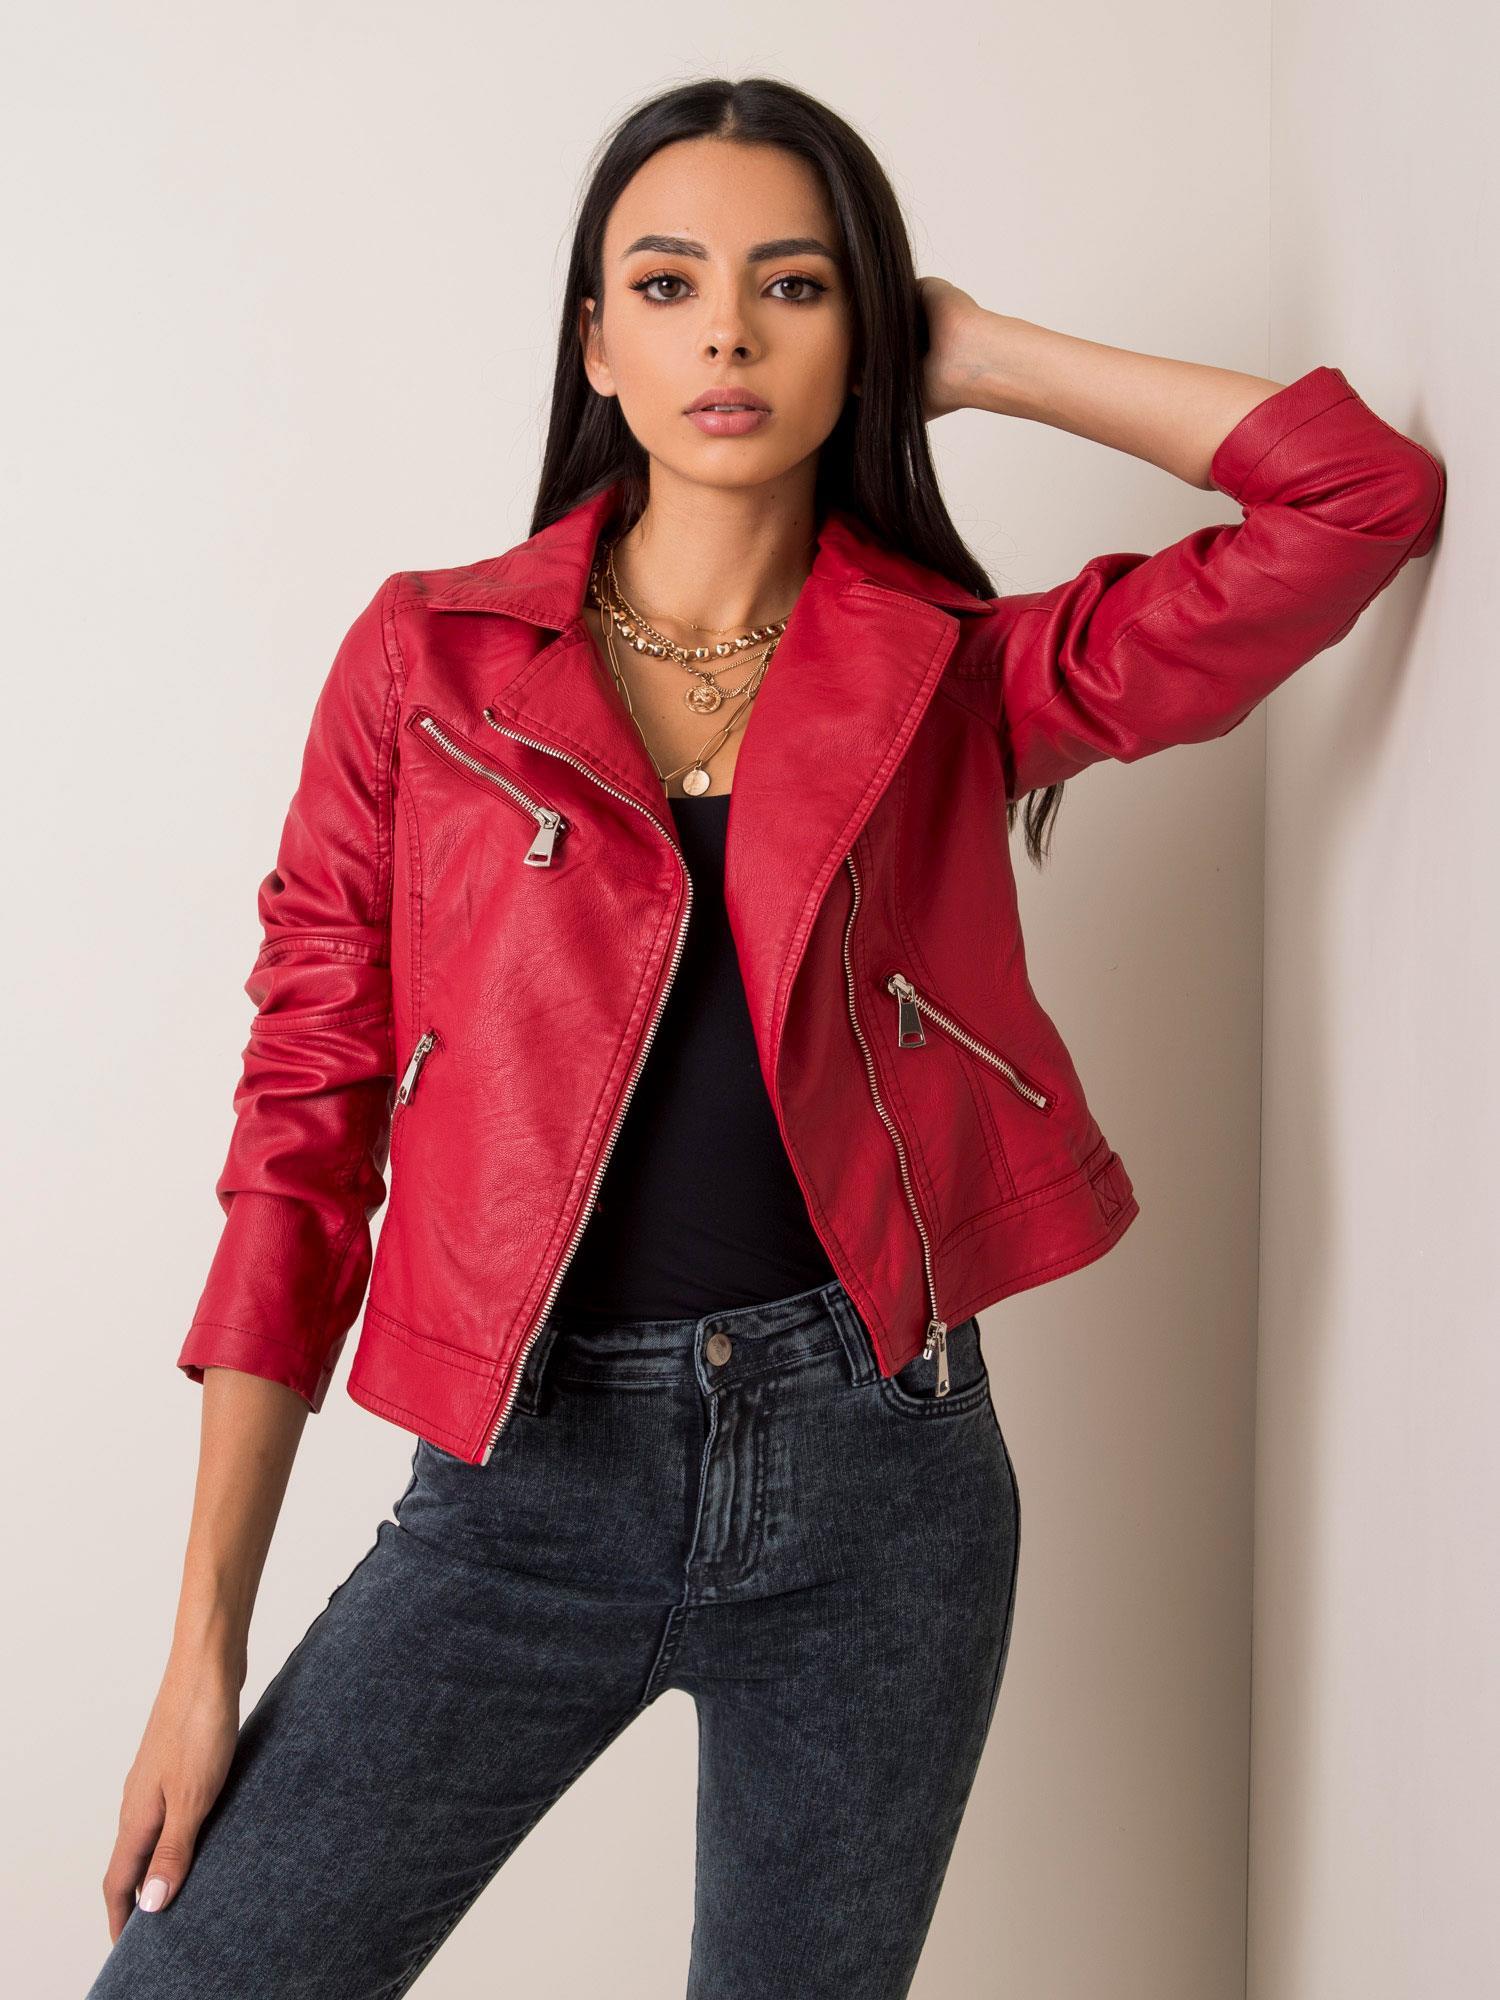 Dámská červená koženková bunda NM-DE-KR-G88.15X-red Velikost: XS